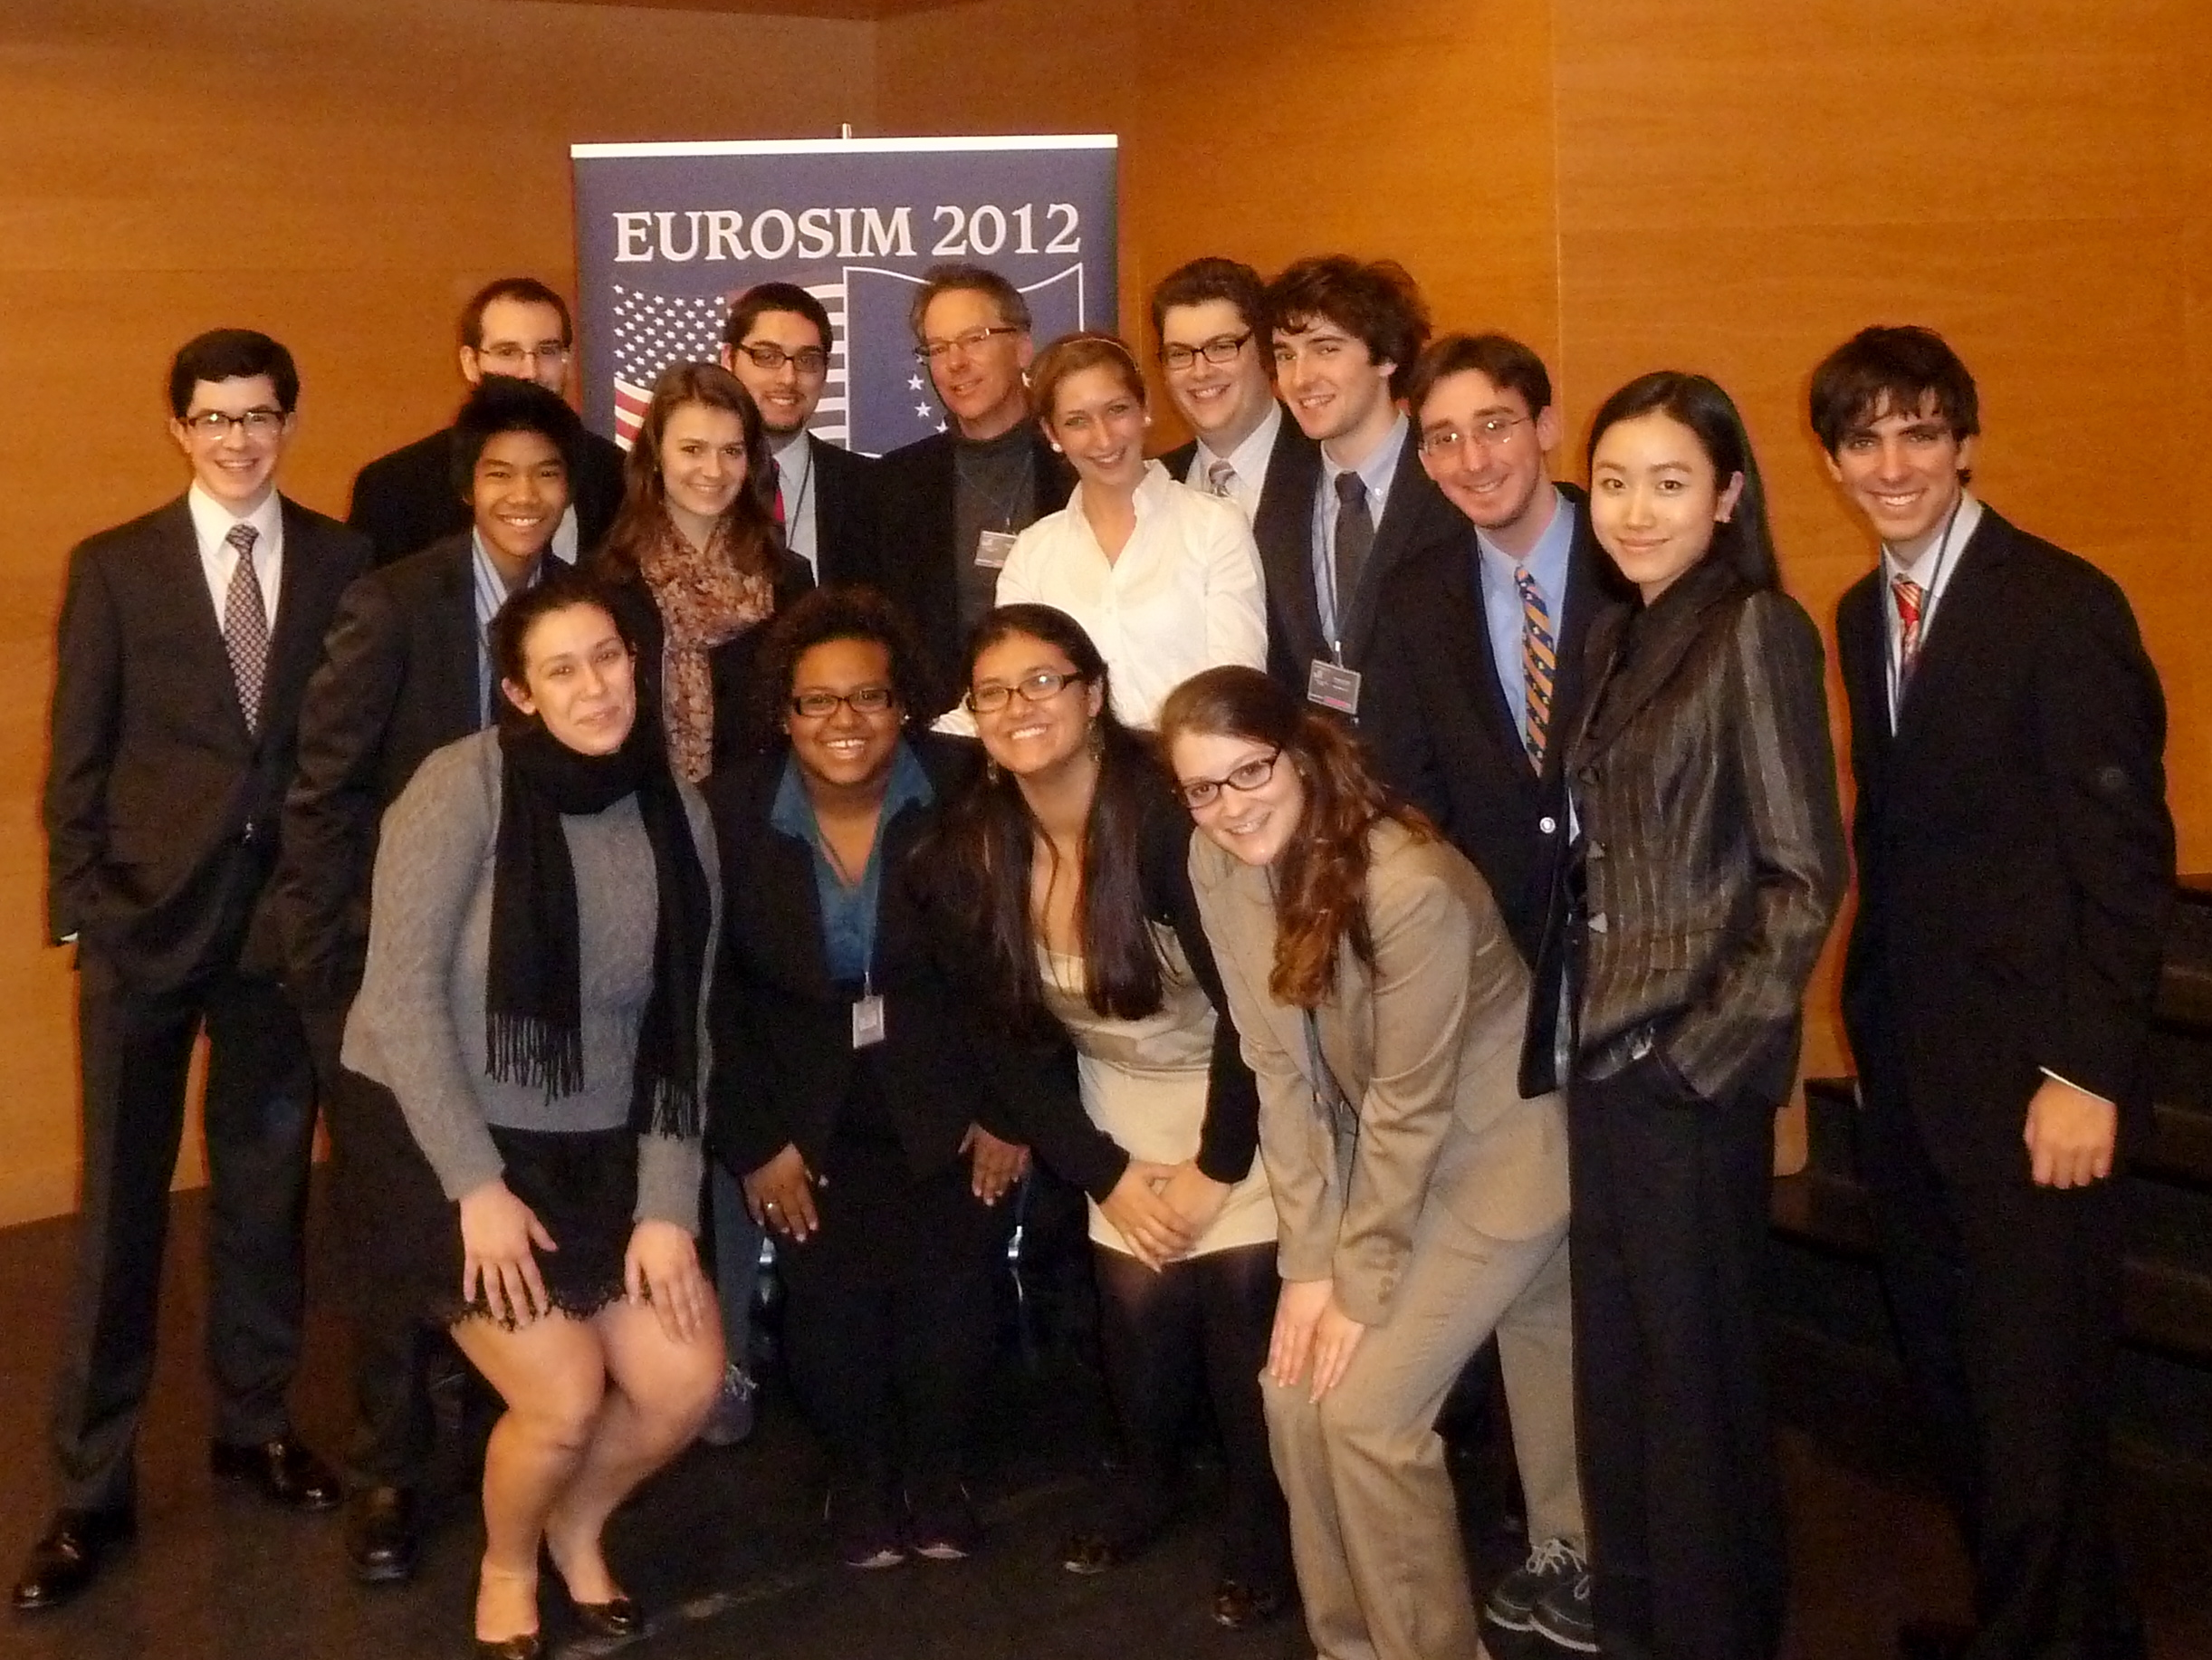 Model European Club members with Professor Alan Cafruny in Wroclaw, Poland.